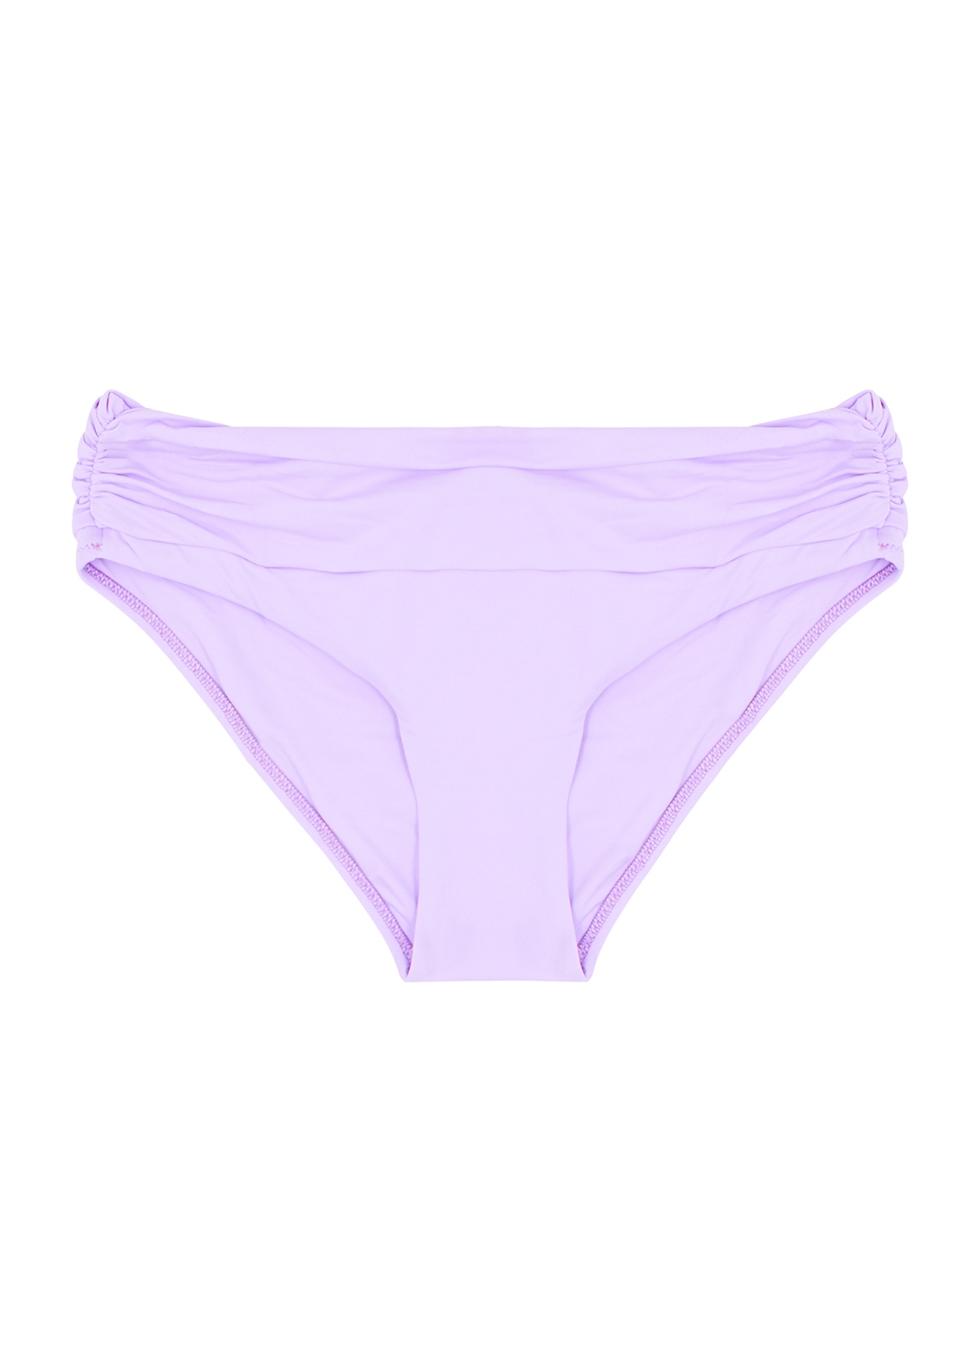 Bel Air lilac bikini briefs